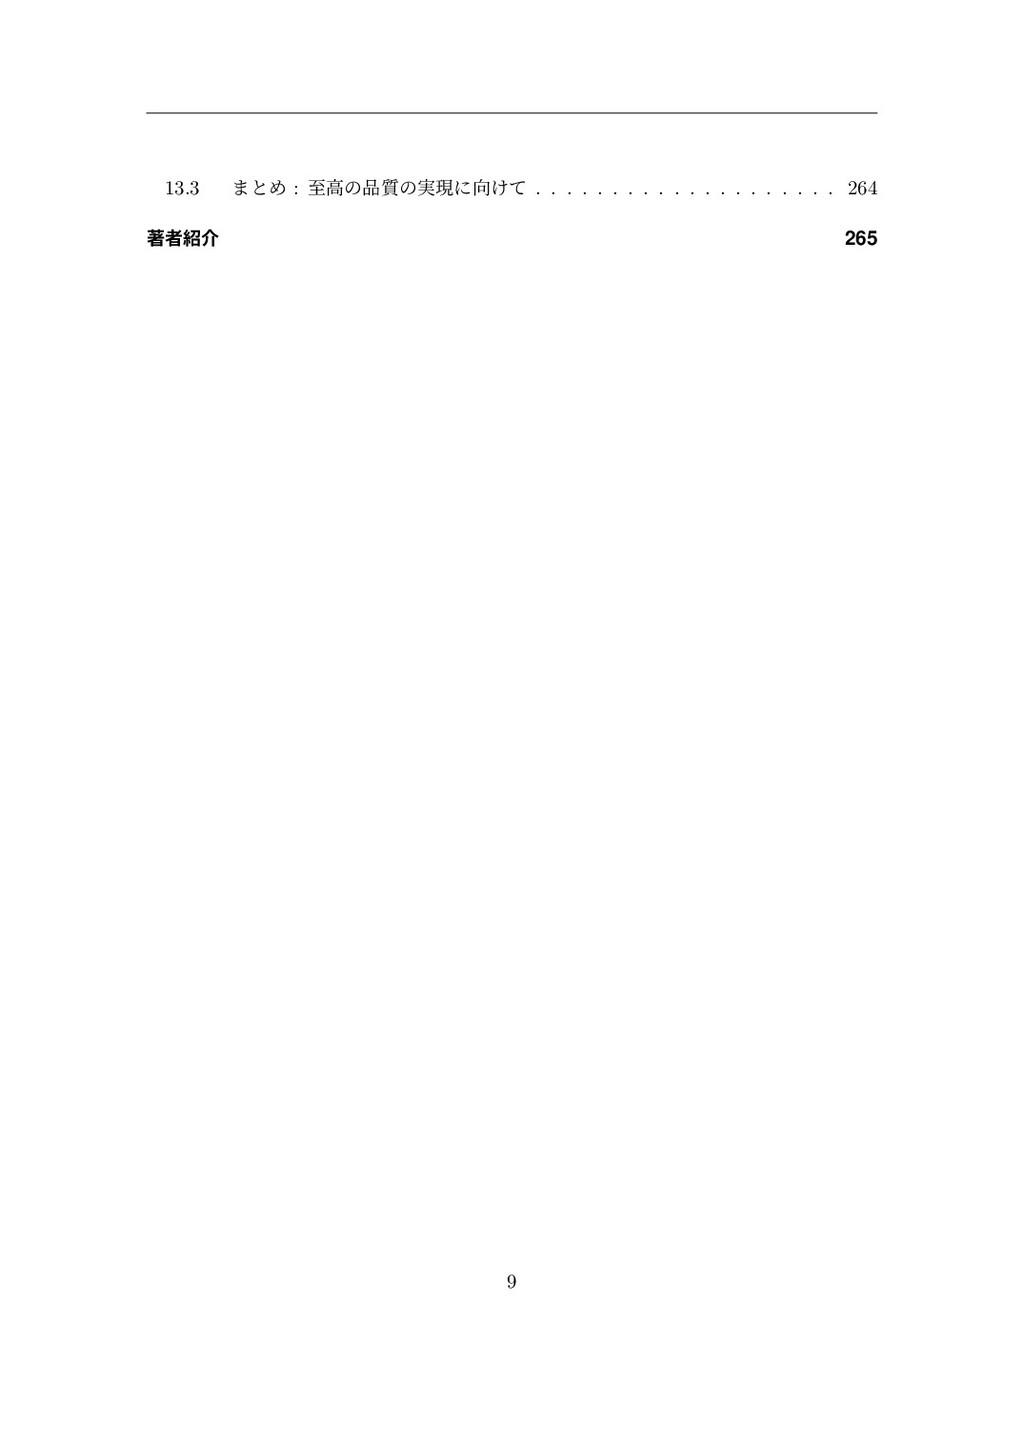 13.3 ױכ״ : 蔷둚ס鮐ס㵅槁מ⻔ׄי . . . . . . . . . . . ....